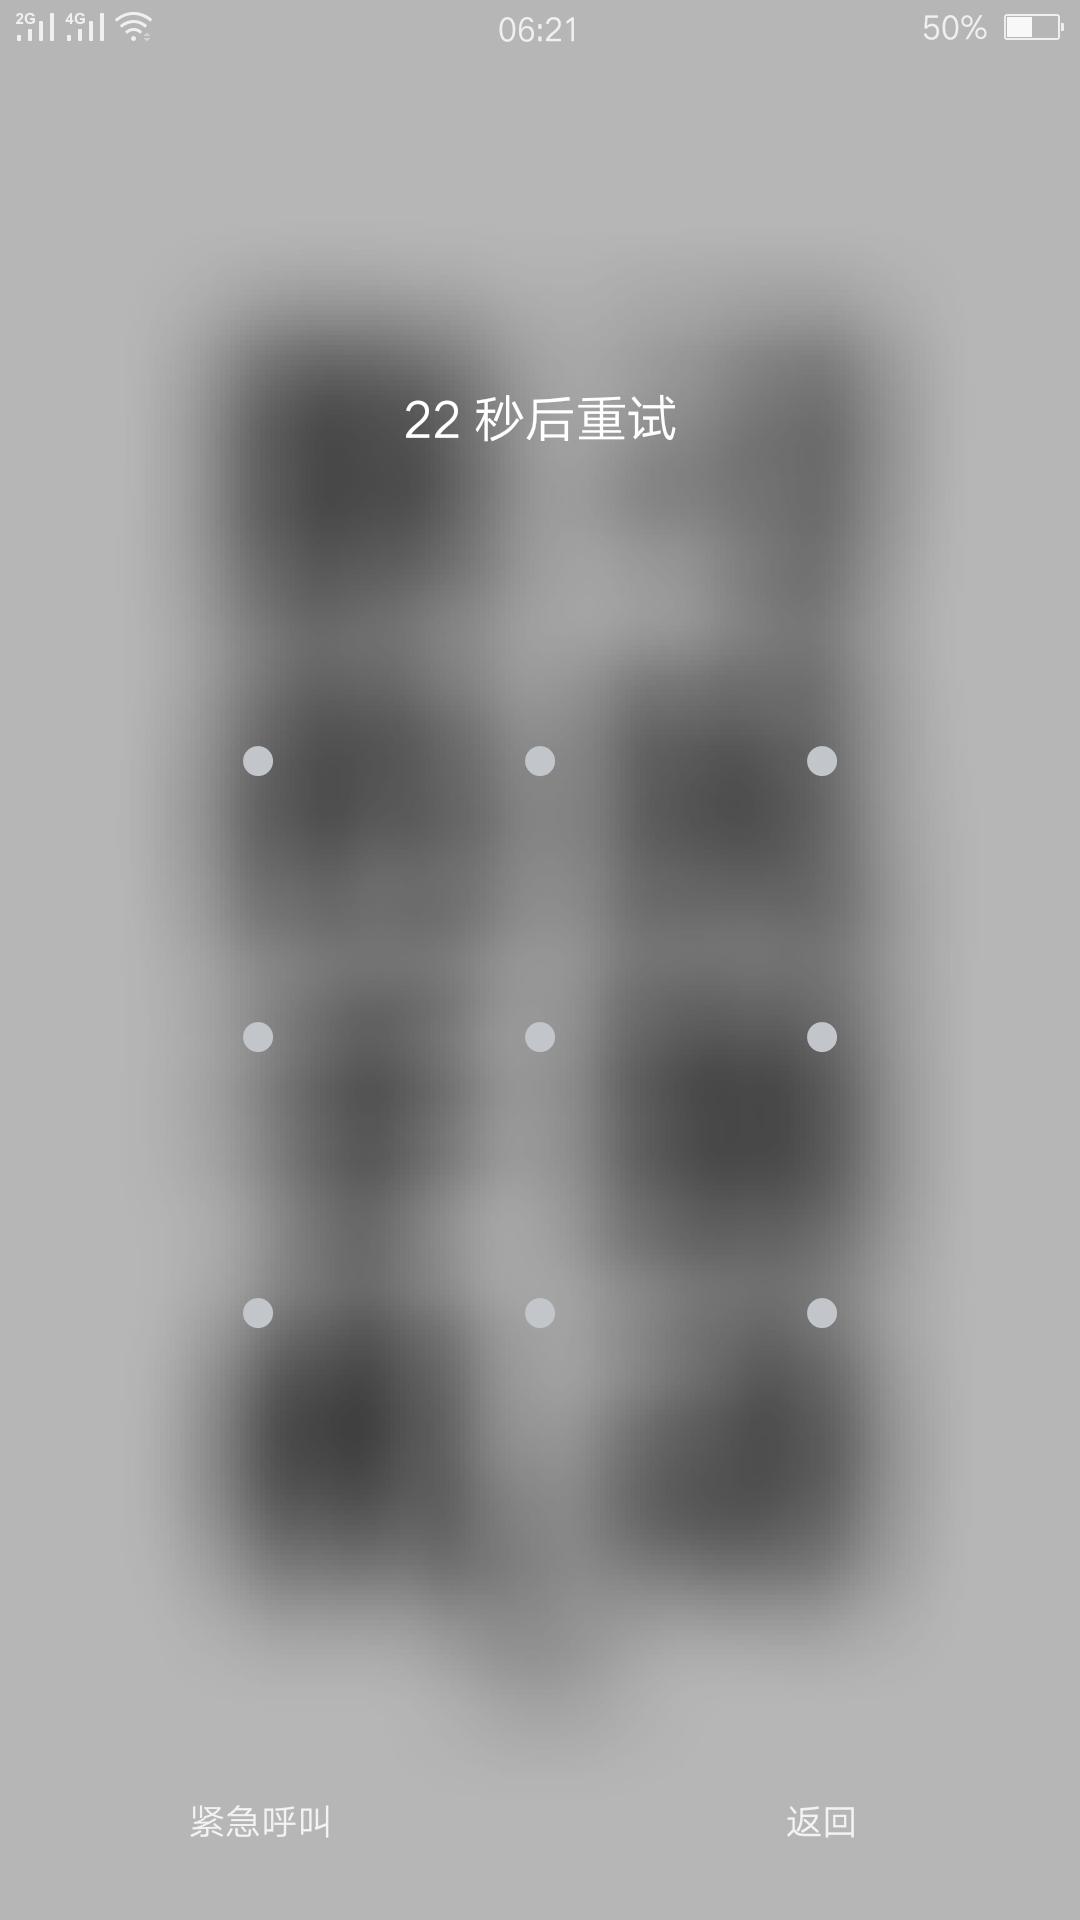 oppo r9 忘记锁屏图案